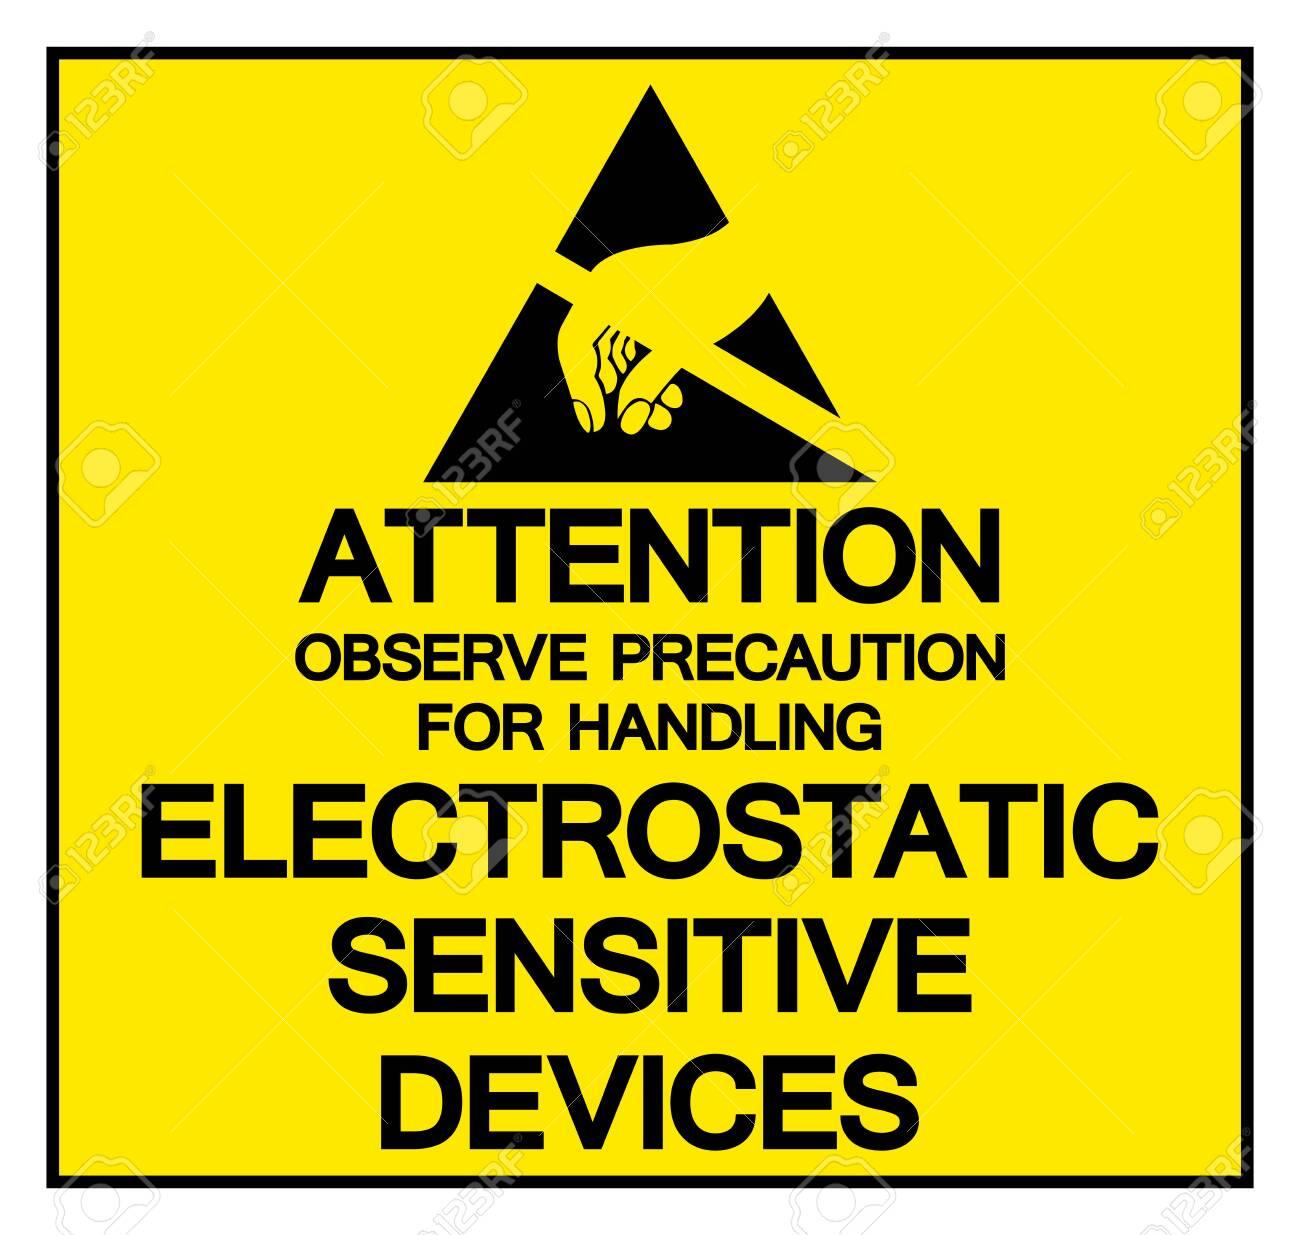 Attention Observe Precaution For Handling Electrostatic Sensitive Device Symbol Sign, Vector Illustration, Isolated On White Background Label . - 124267069